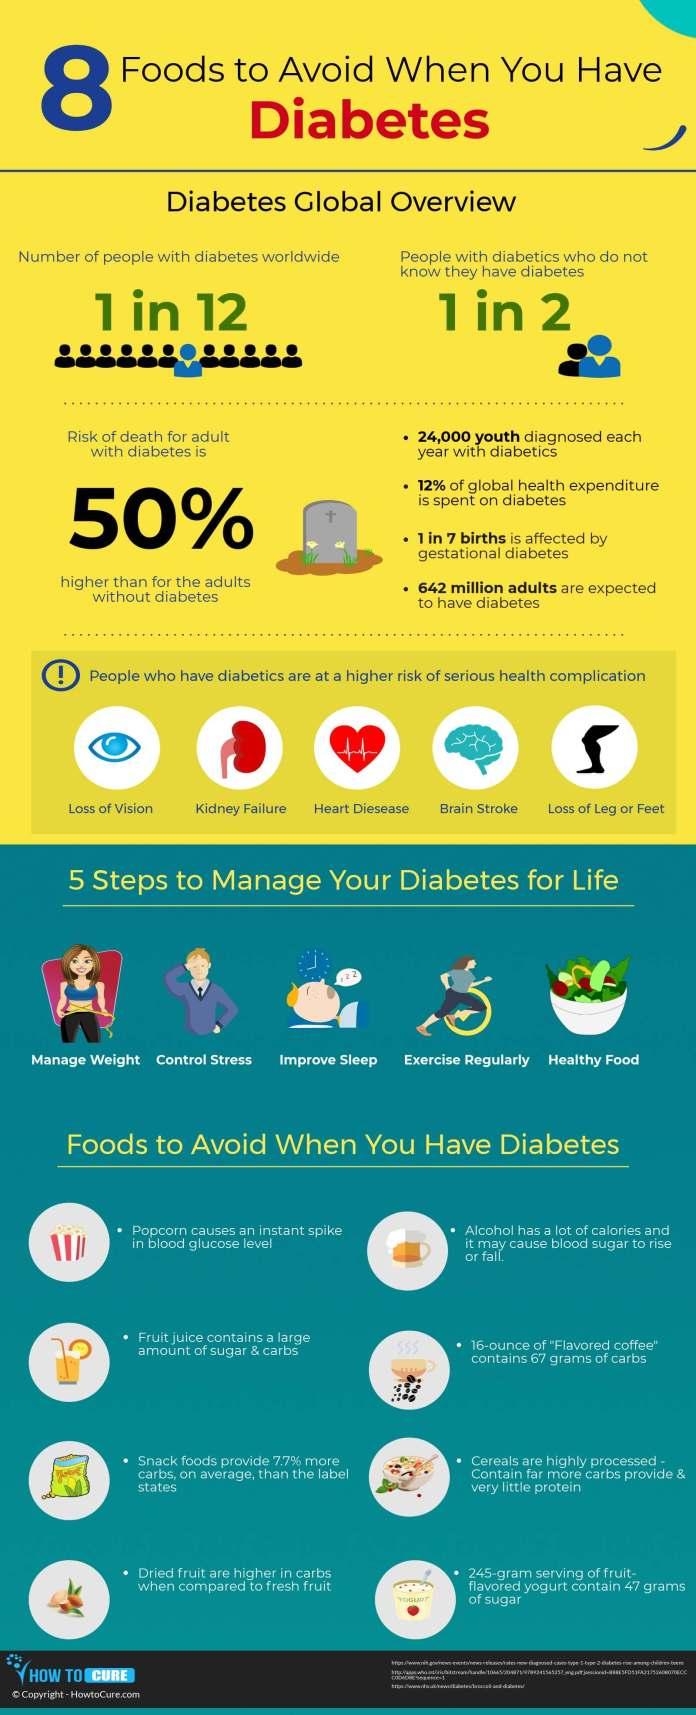 foods avoid diabetes - infographic